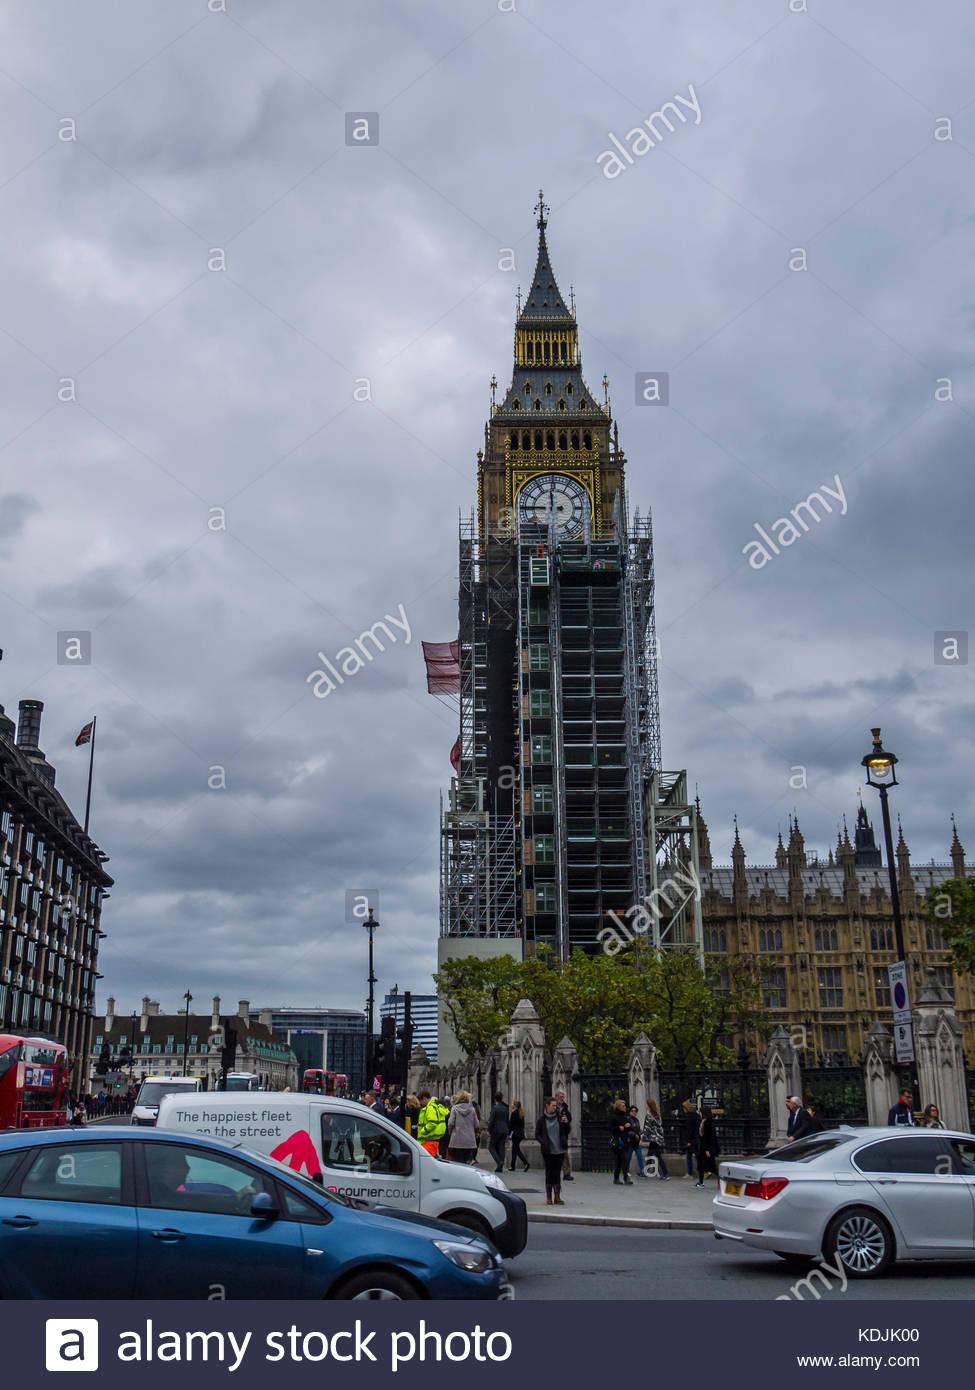 Big Ben clock unter Reparatur London England Stockbild